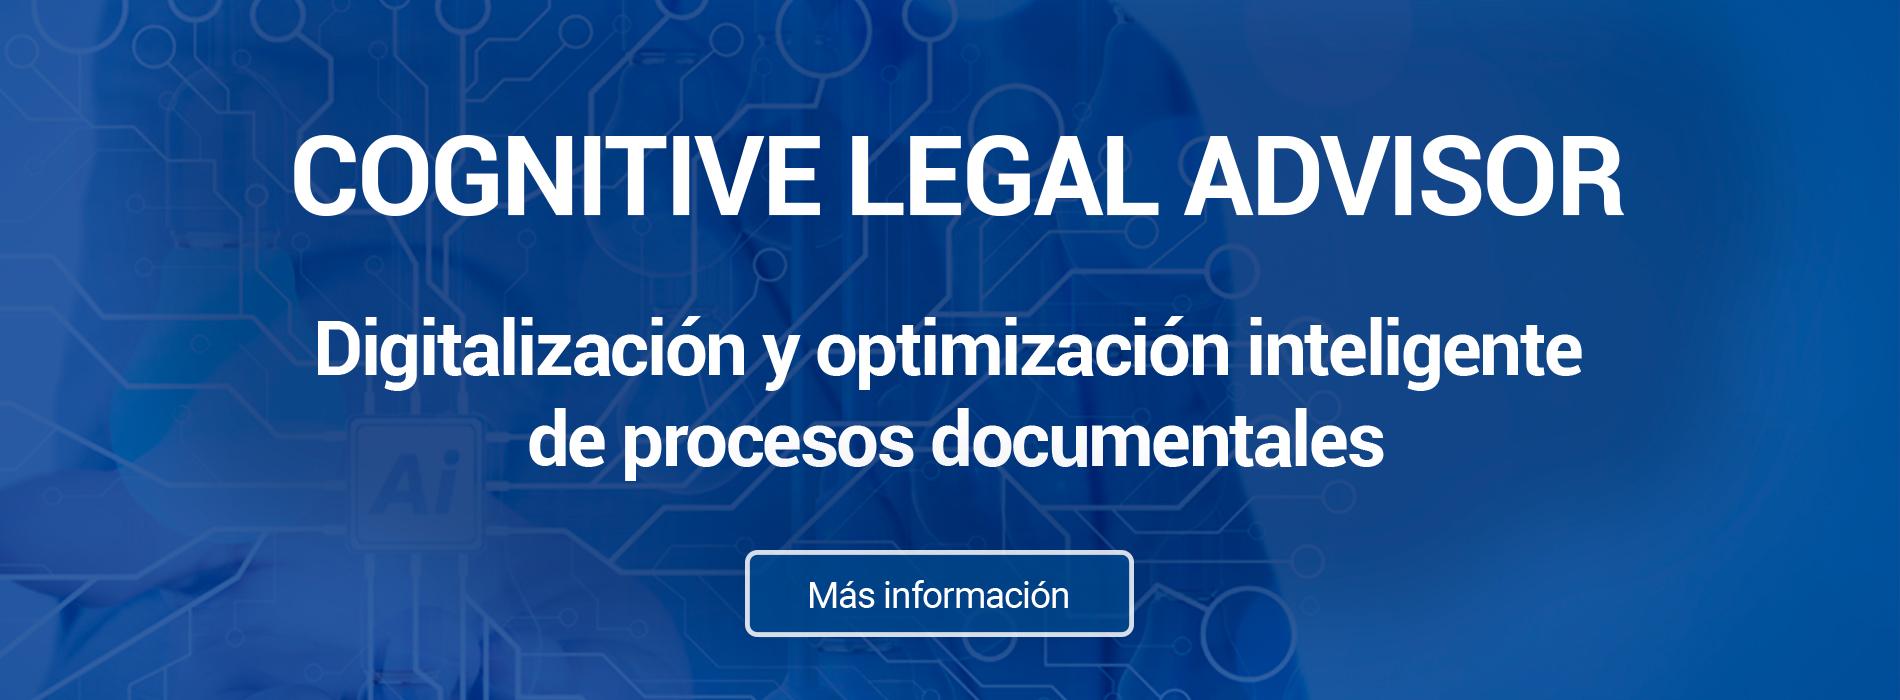 cognitive legal advisor